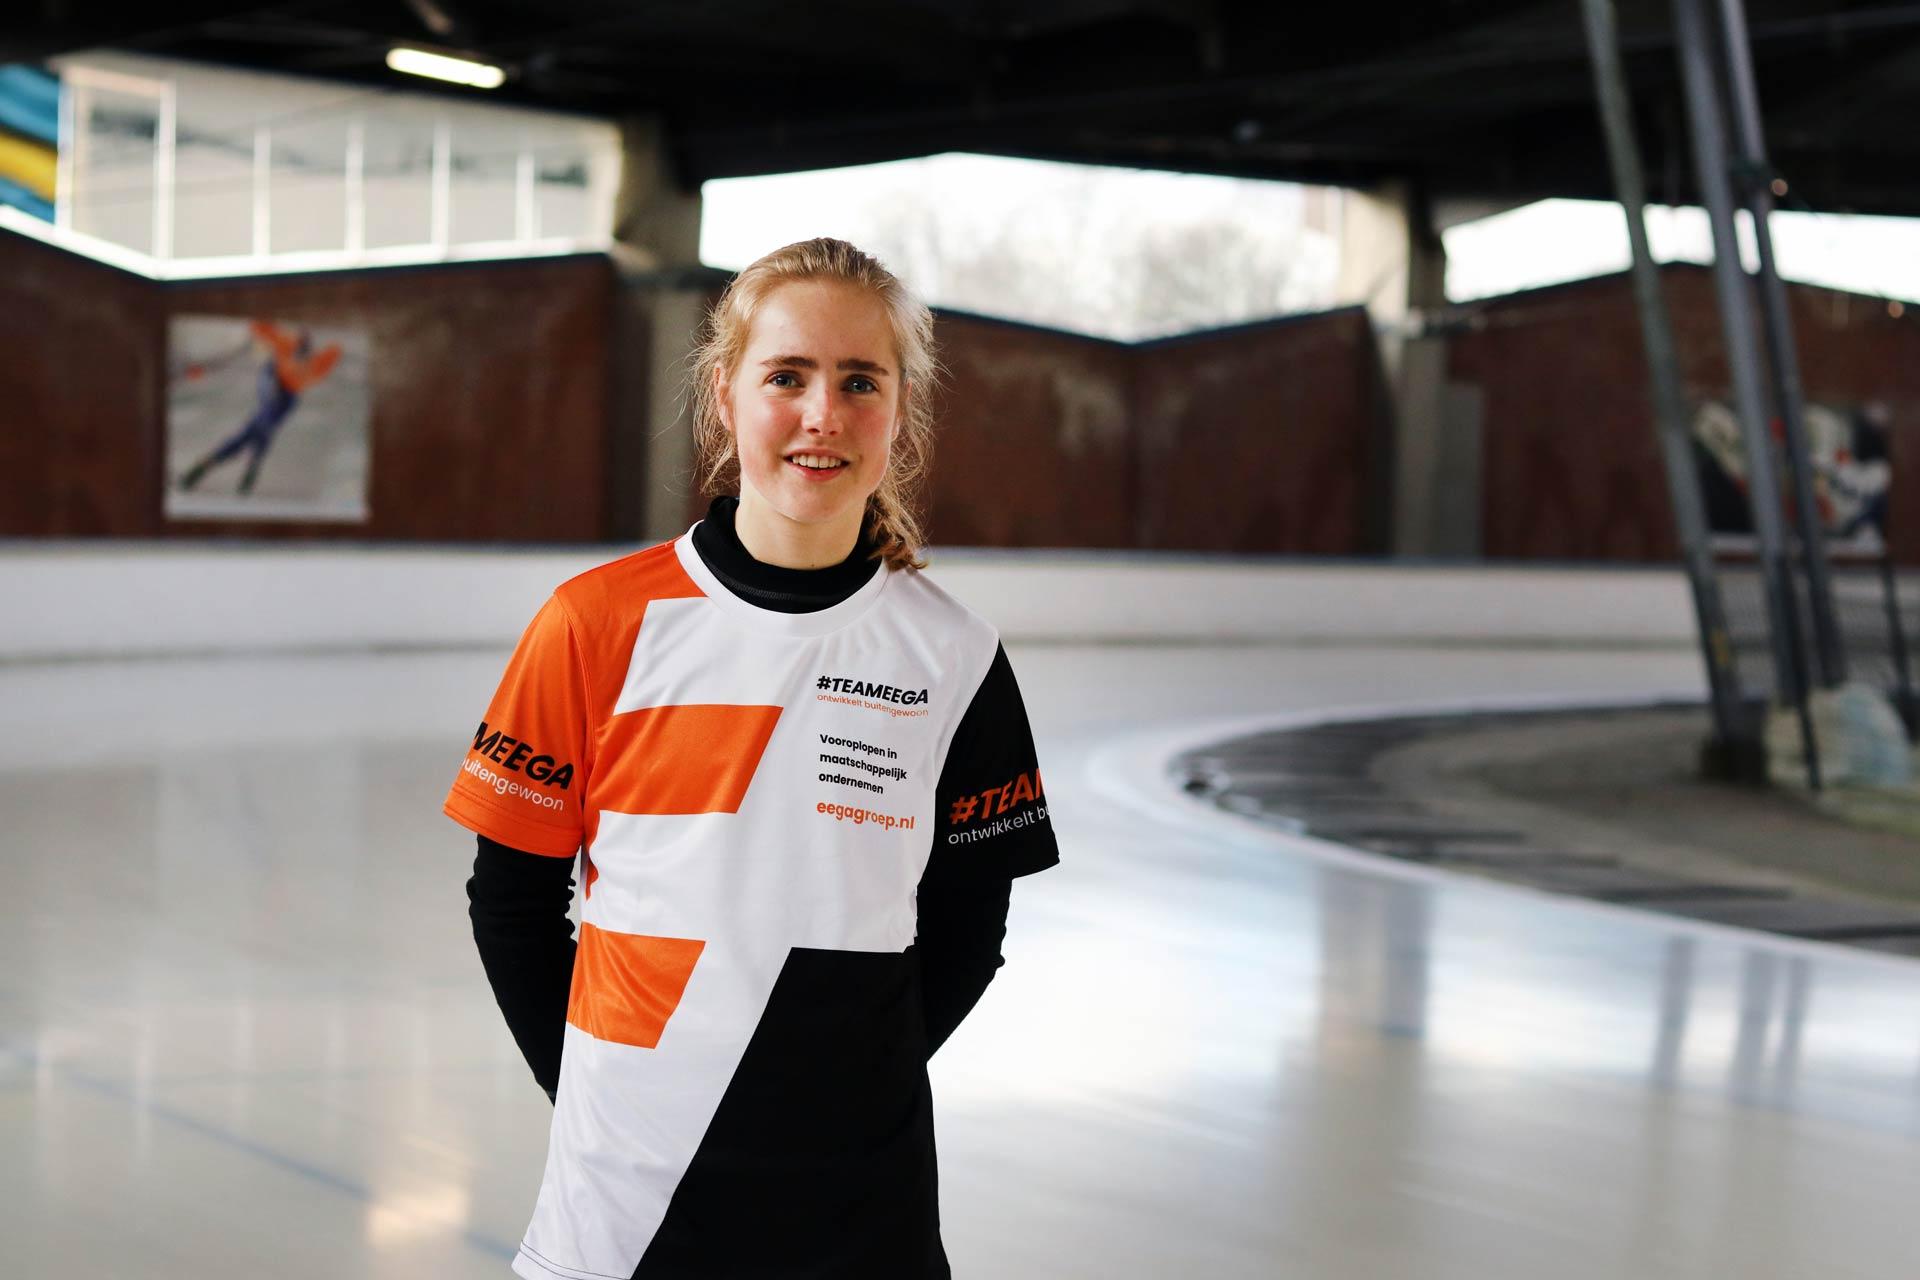 Eline Jansen Profiel I Samenwerking EEGA Groep